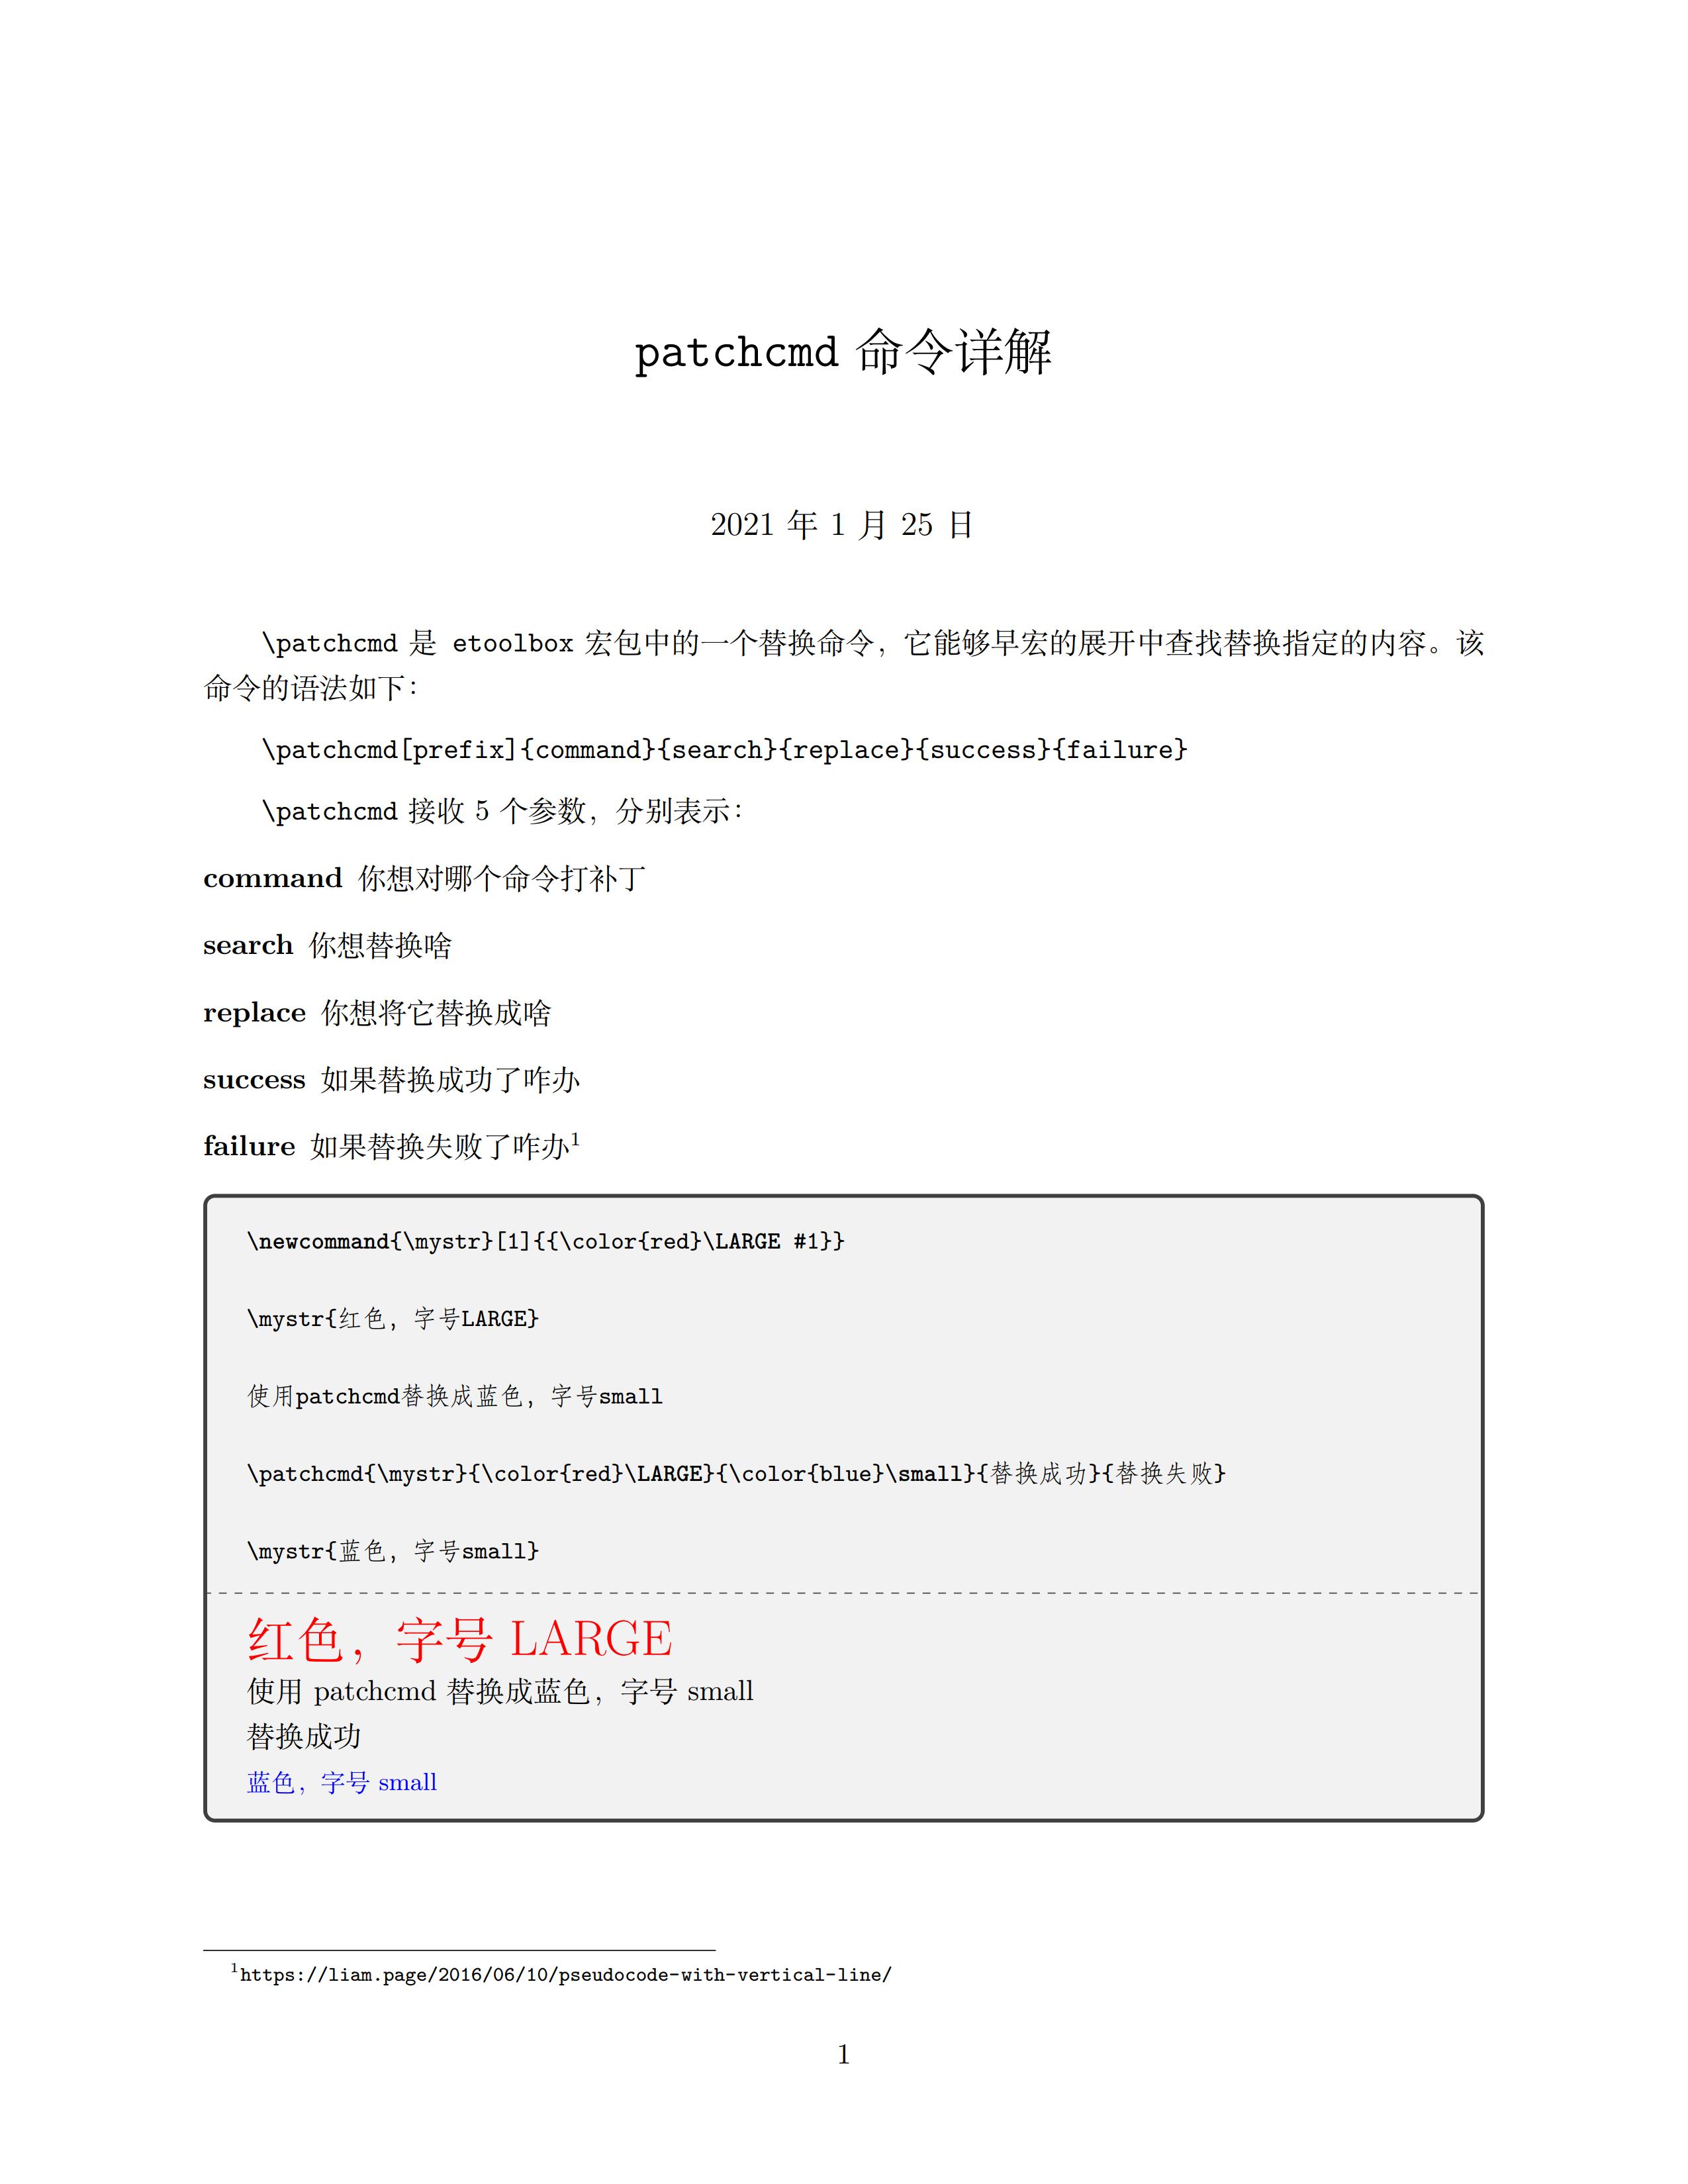 etoolbox 宏包中的 patchcmd 命令详解